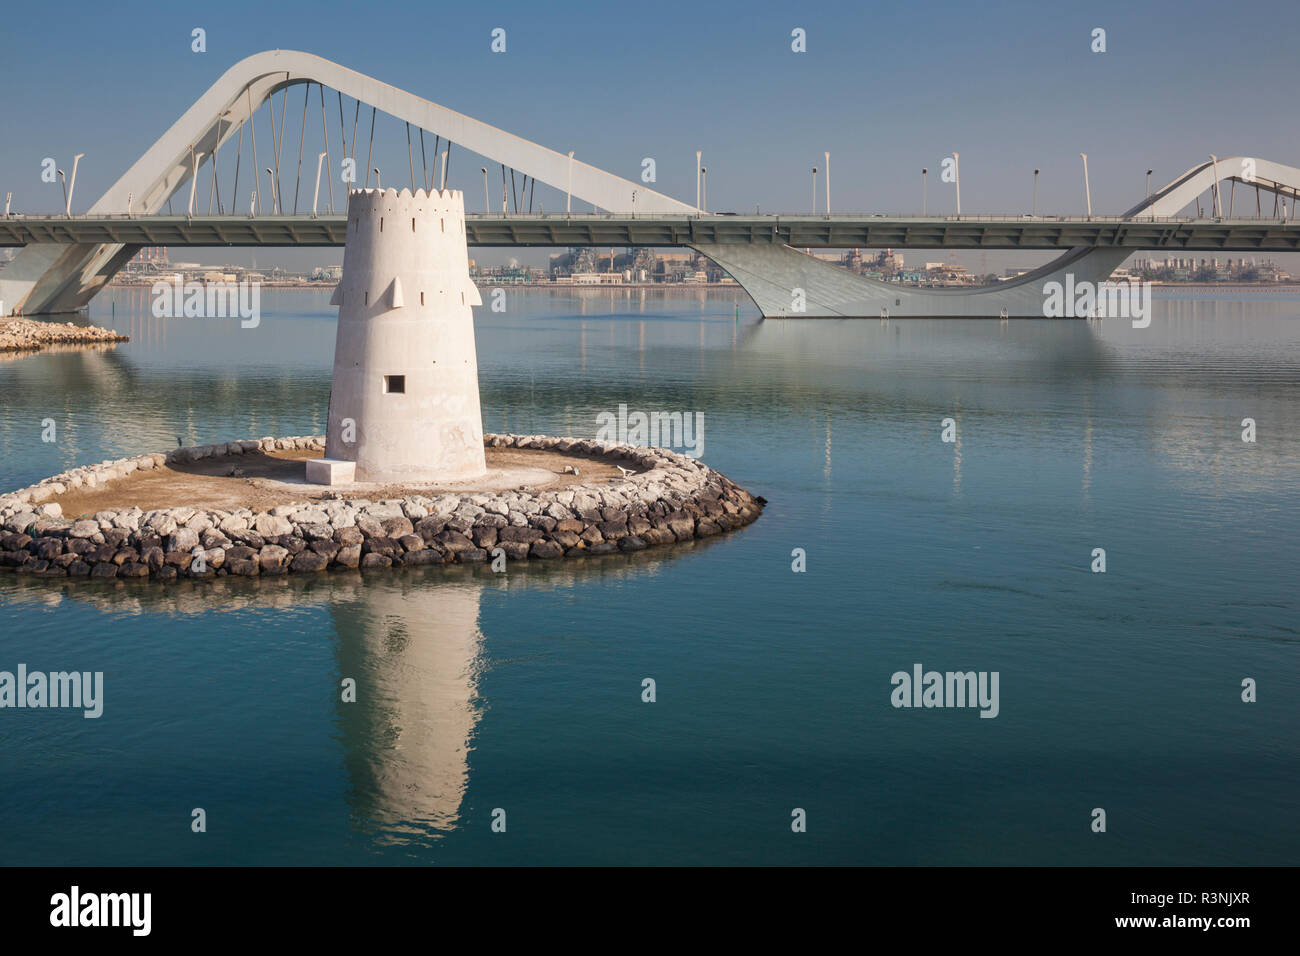 UAE, Abu Dhabi. Sheikh Zayed Bridge, designed by Zaha Hadid and old Al Maqta Fort watchtower Stock Photo